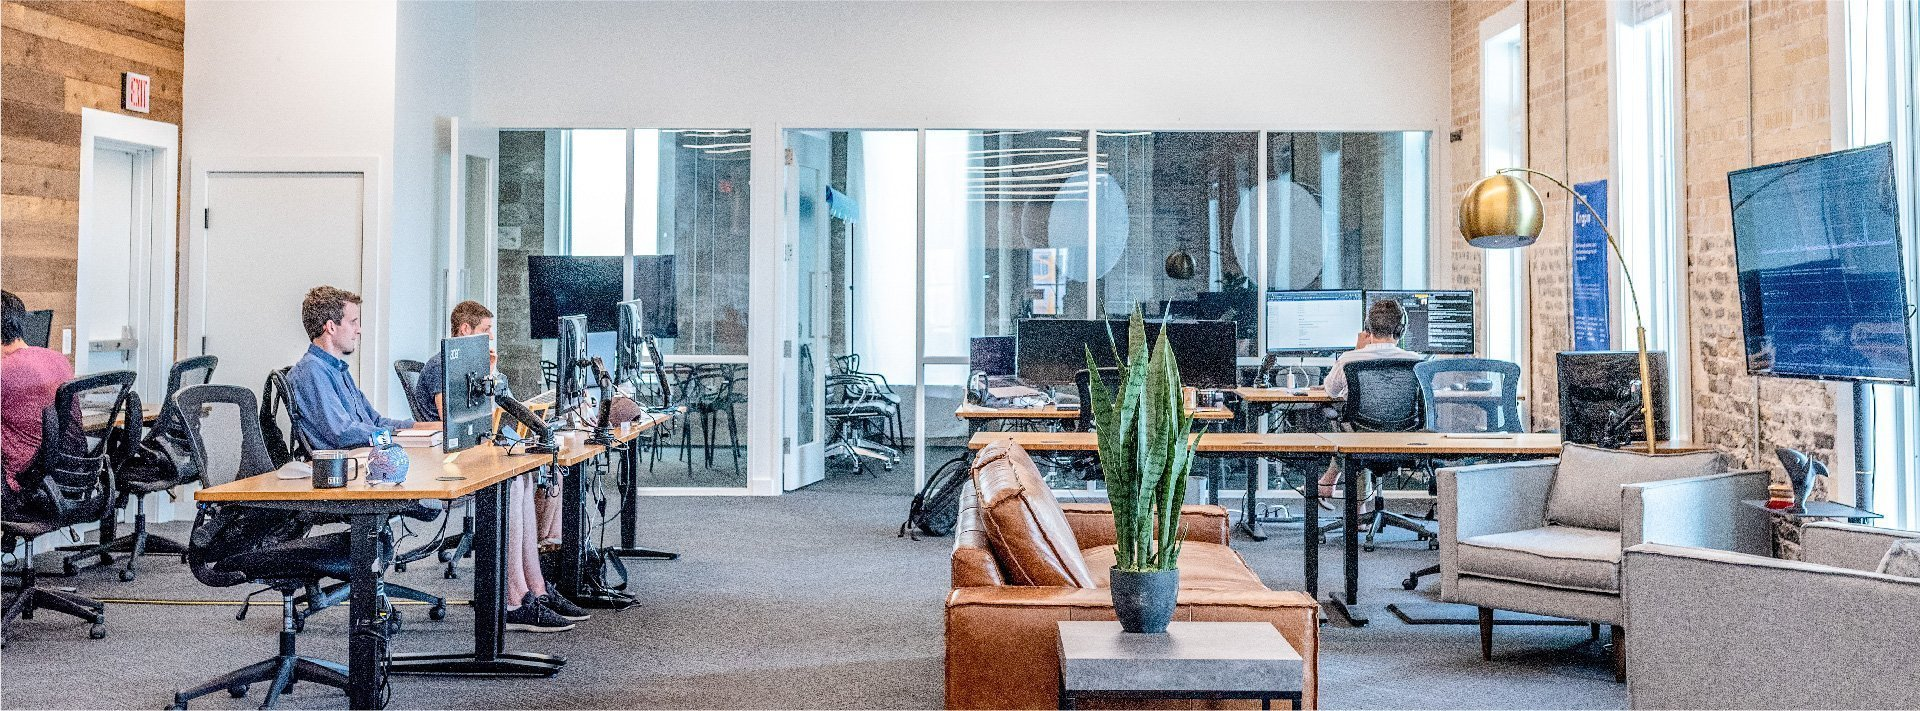 People working in a modern office